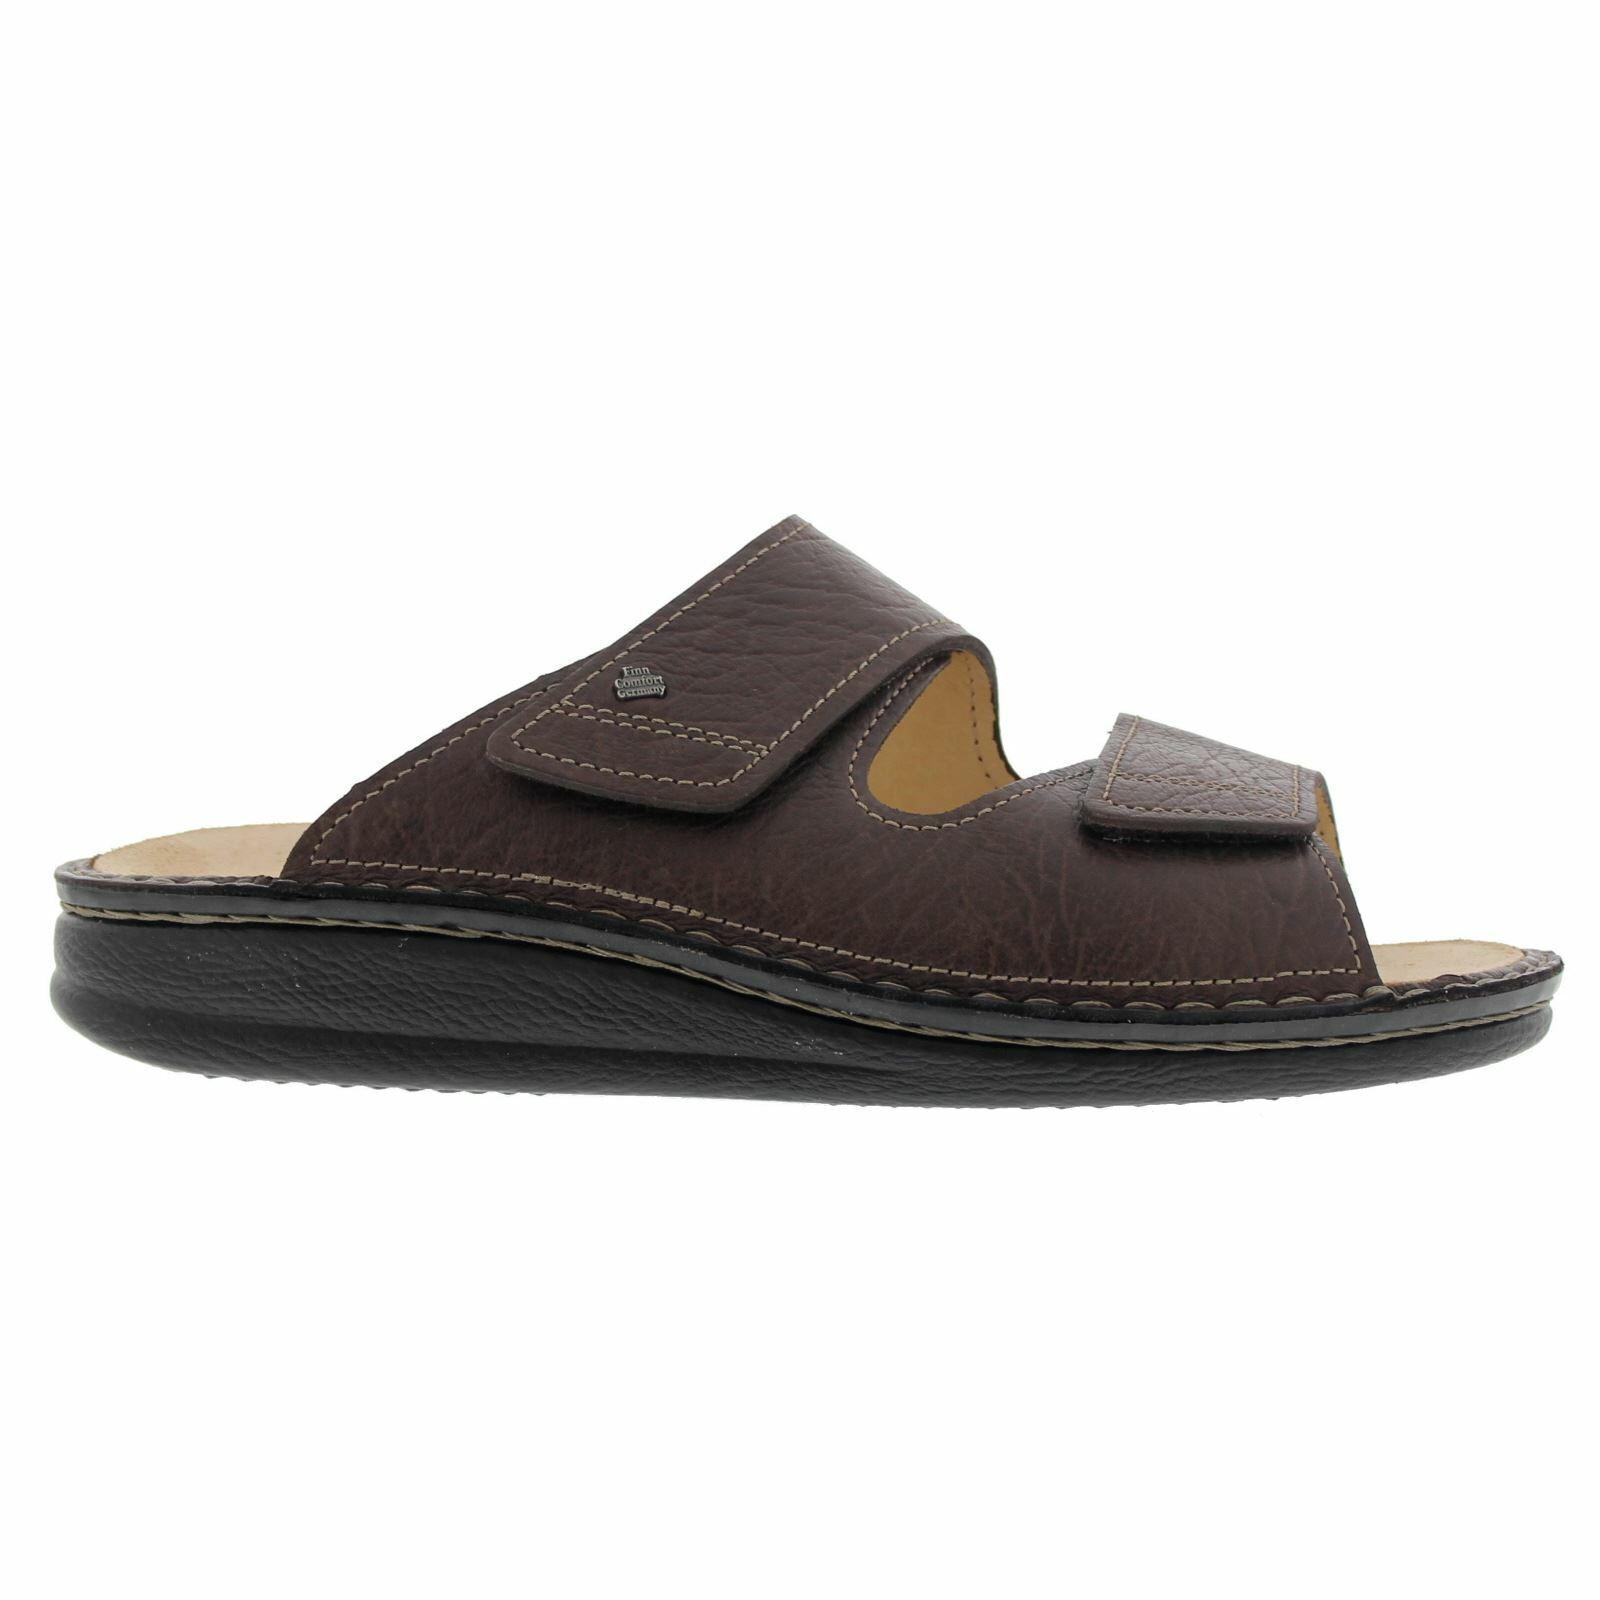 Finn Comfort Mens 1505 Riad Karbo Brown Leather Sandals